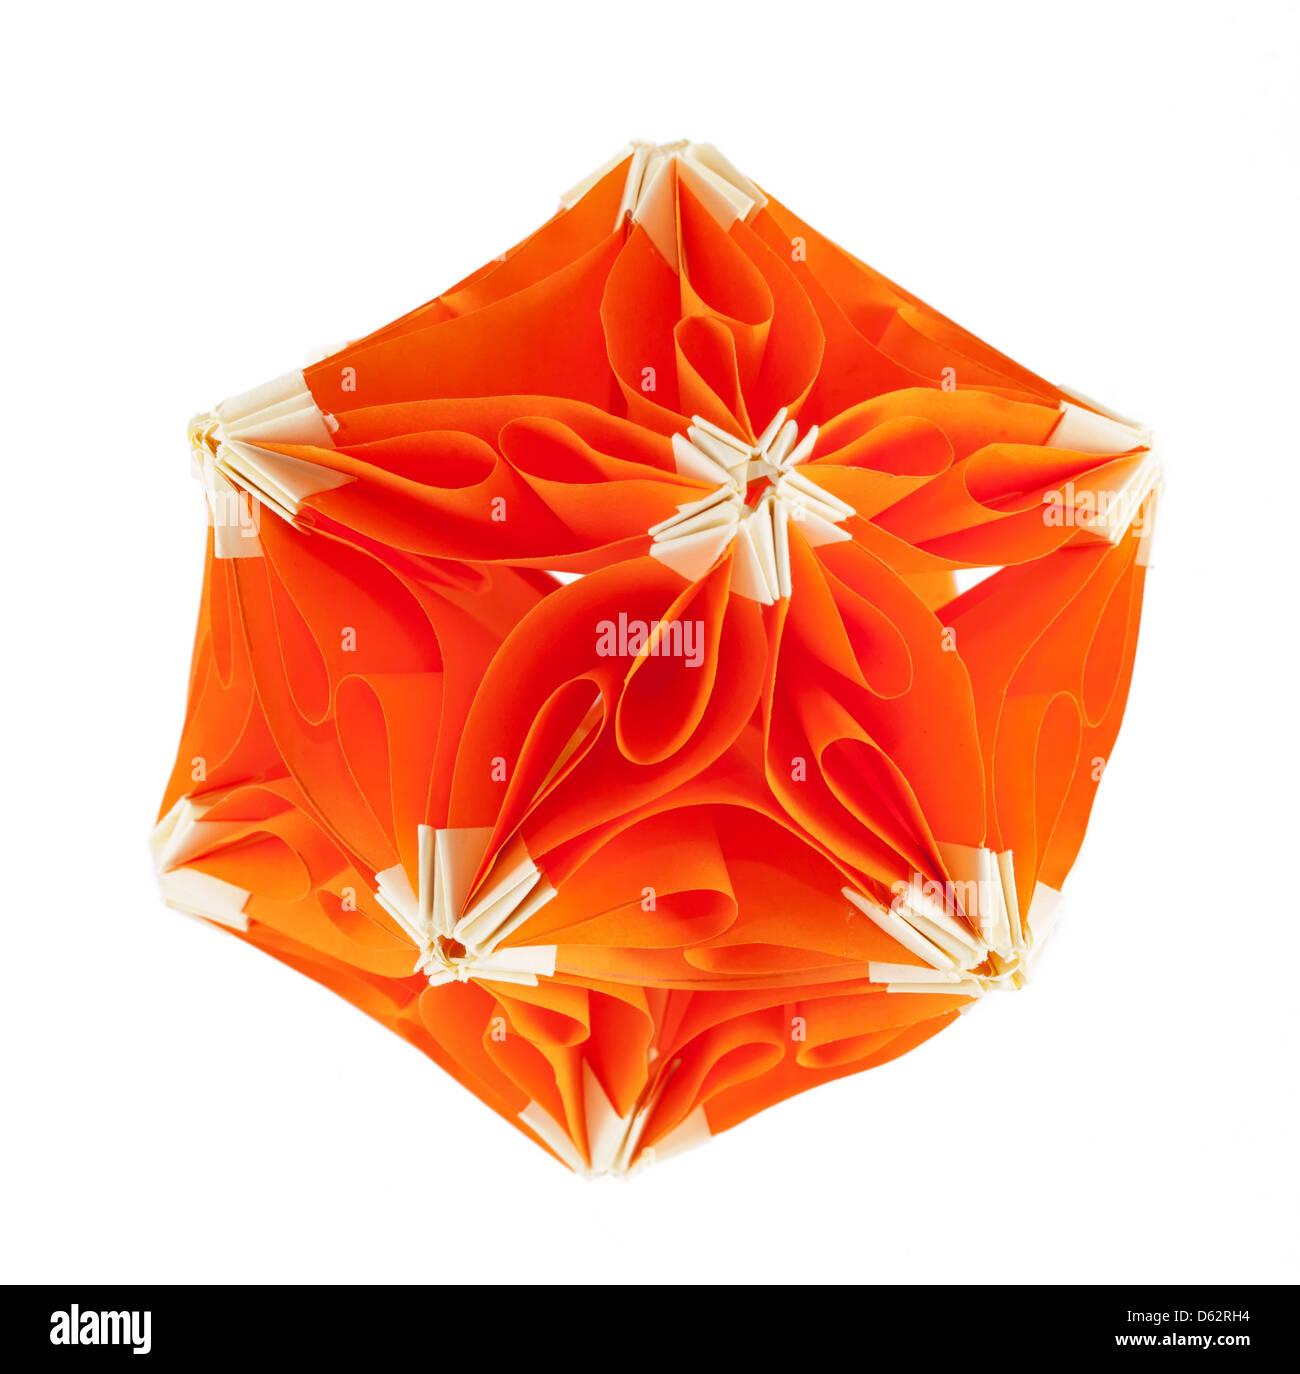 Origami Paper Flower Kusudama Stock Photos Origami Paper Flower